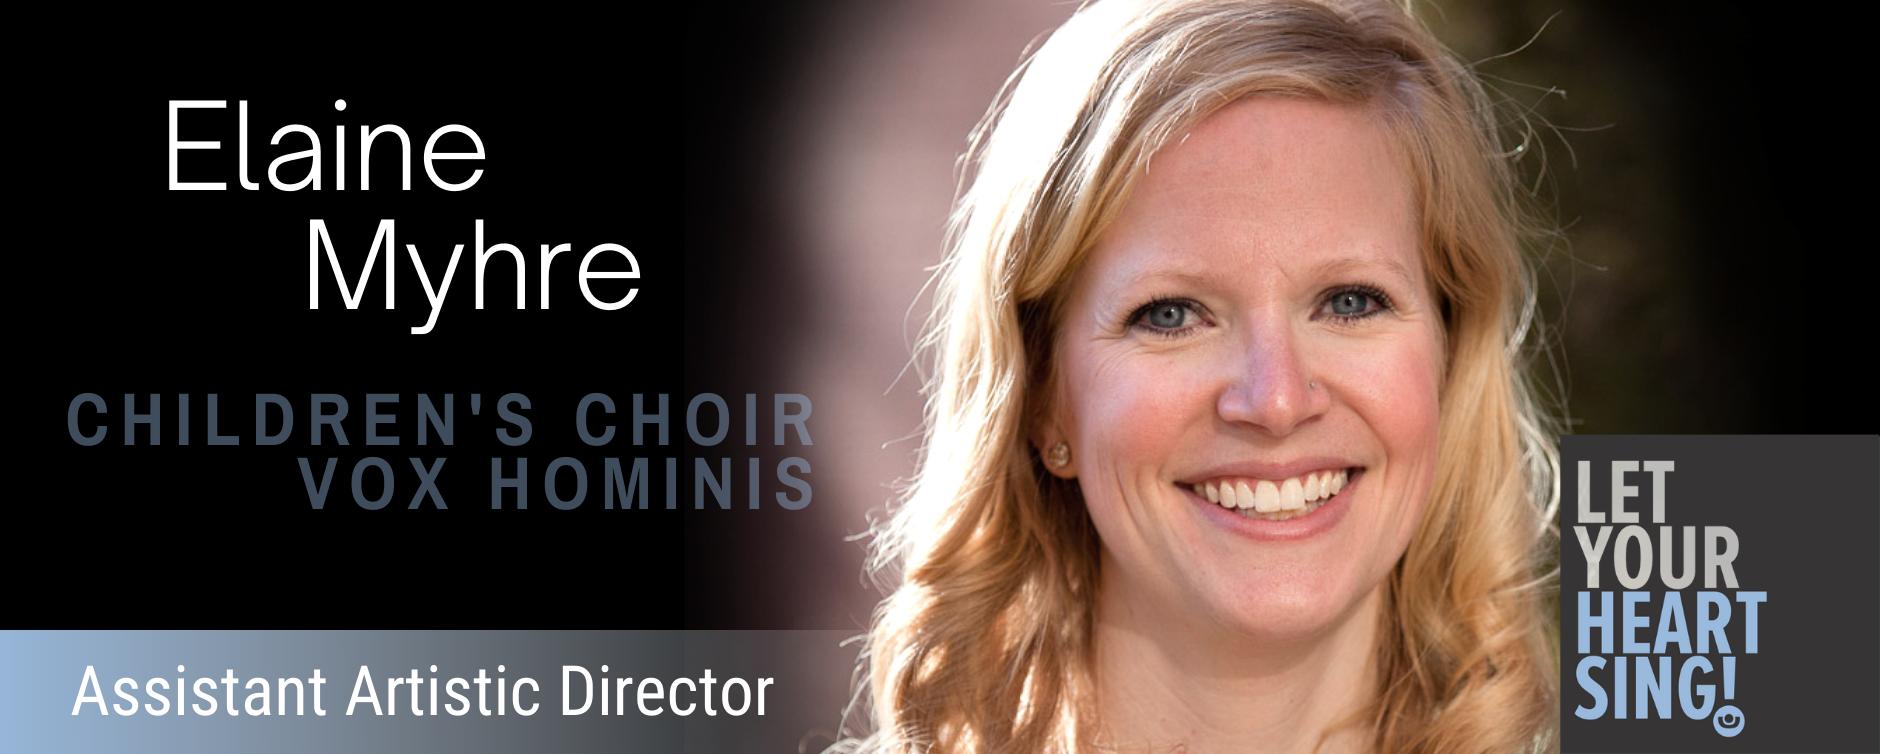 Elaine Mhyre - Assistant Artistic Director